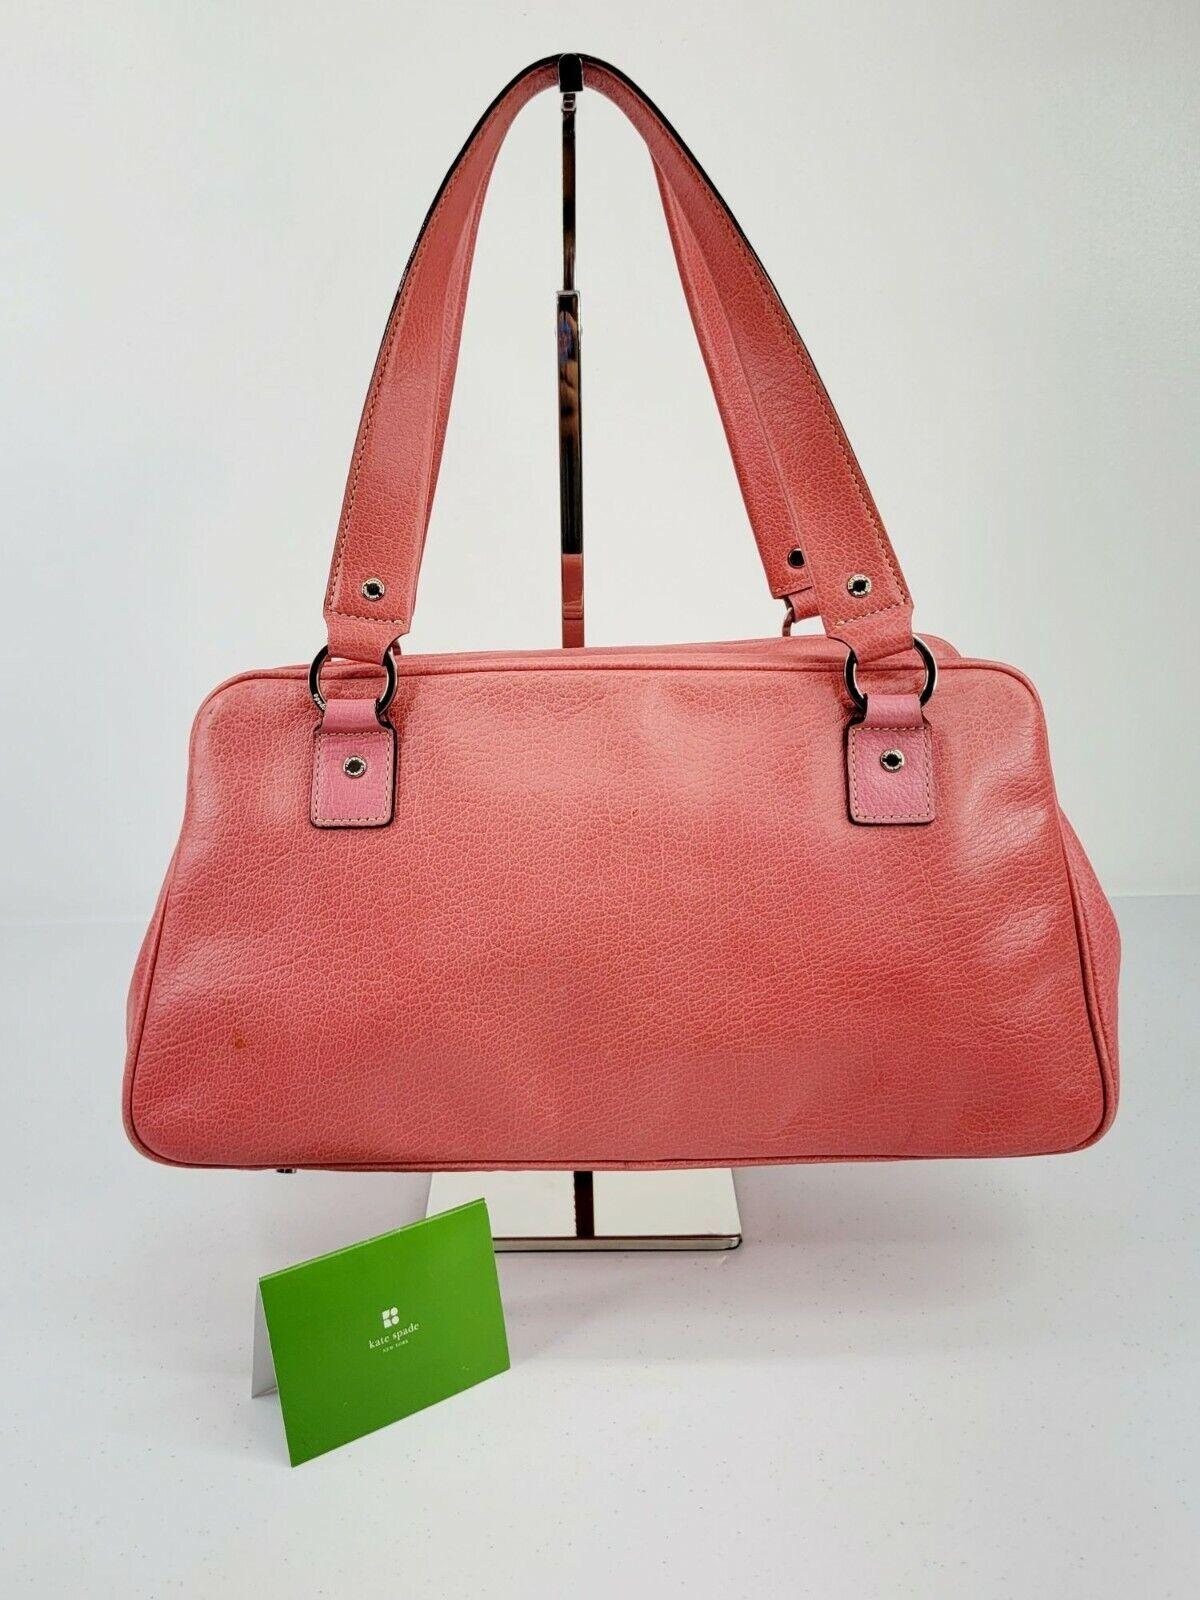 Kate Spade New York Bubblegum Pink Leather Satche… - image 2